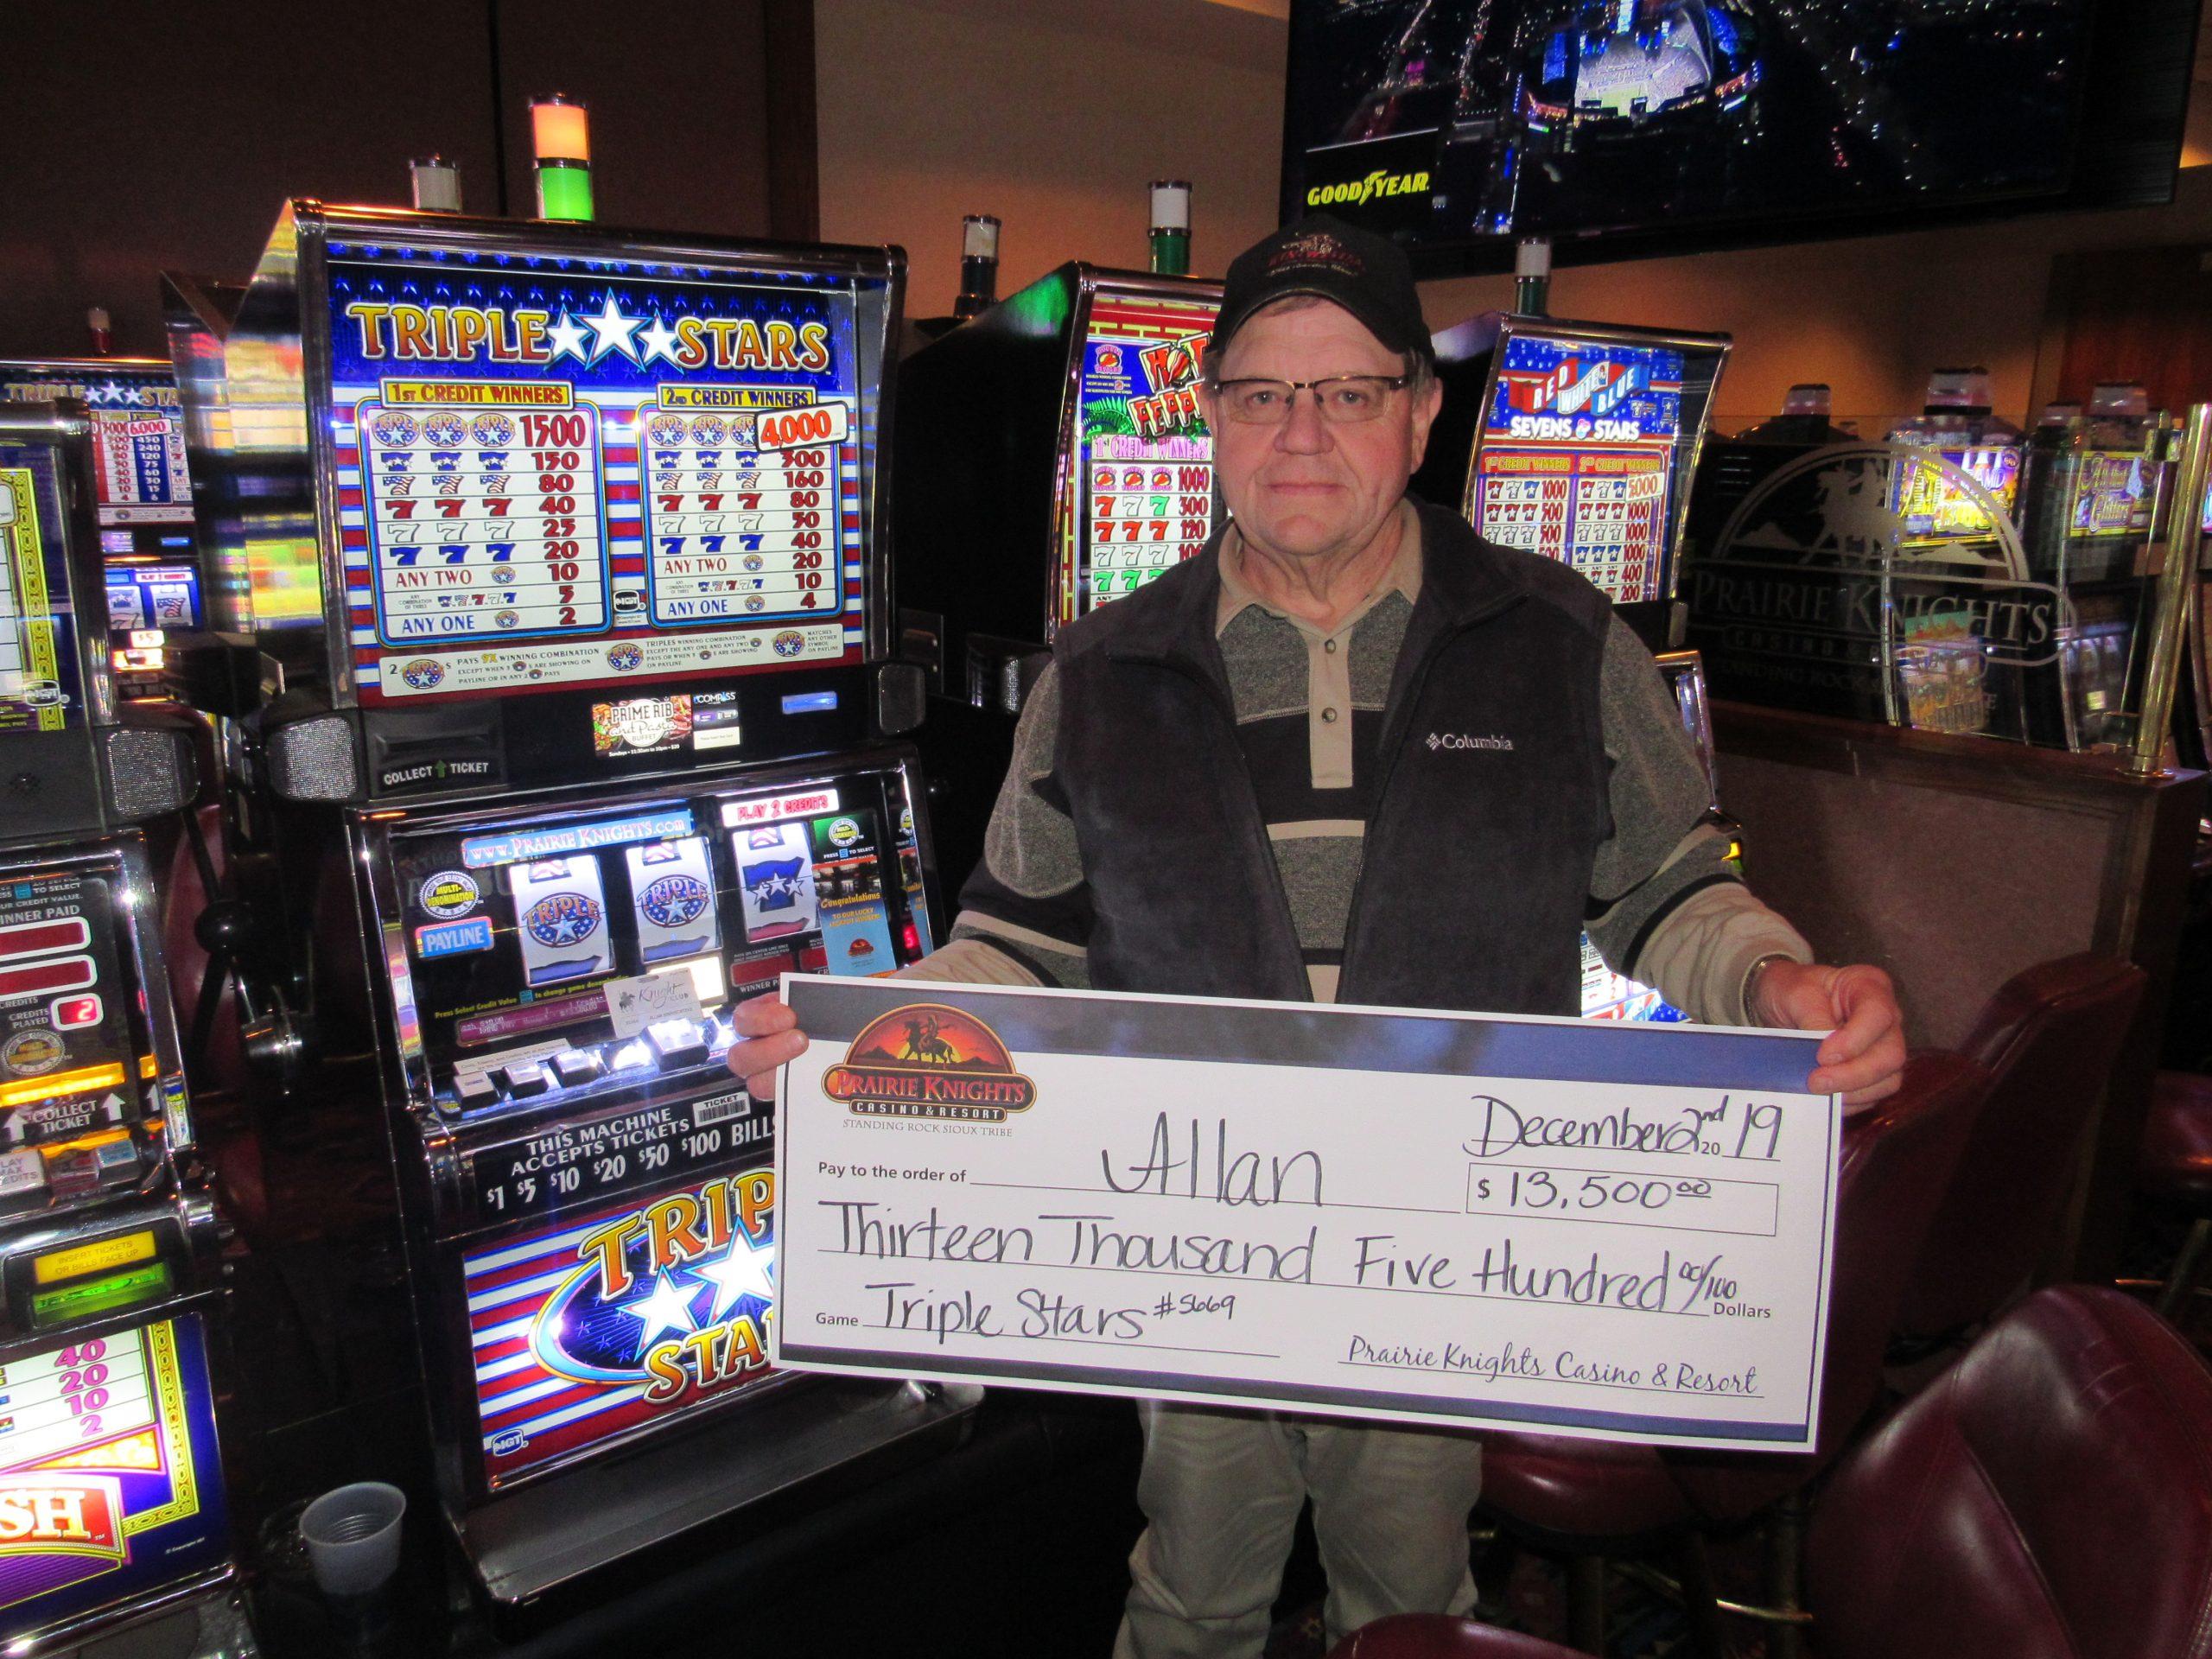 Allan – $13,500